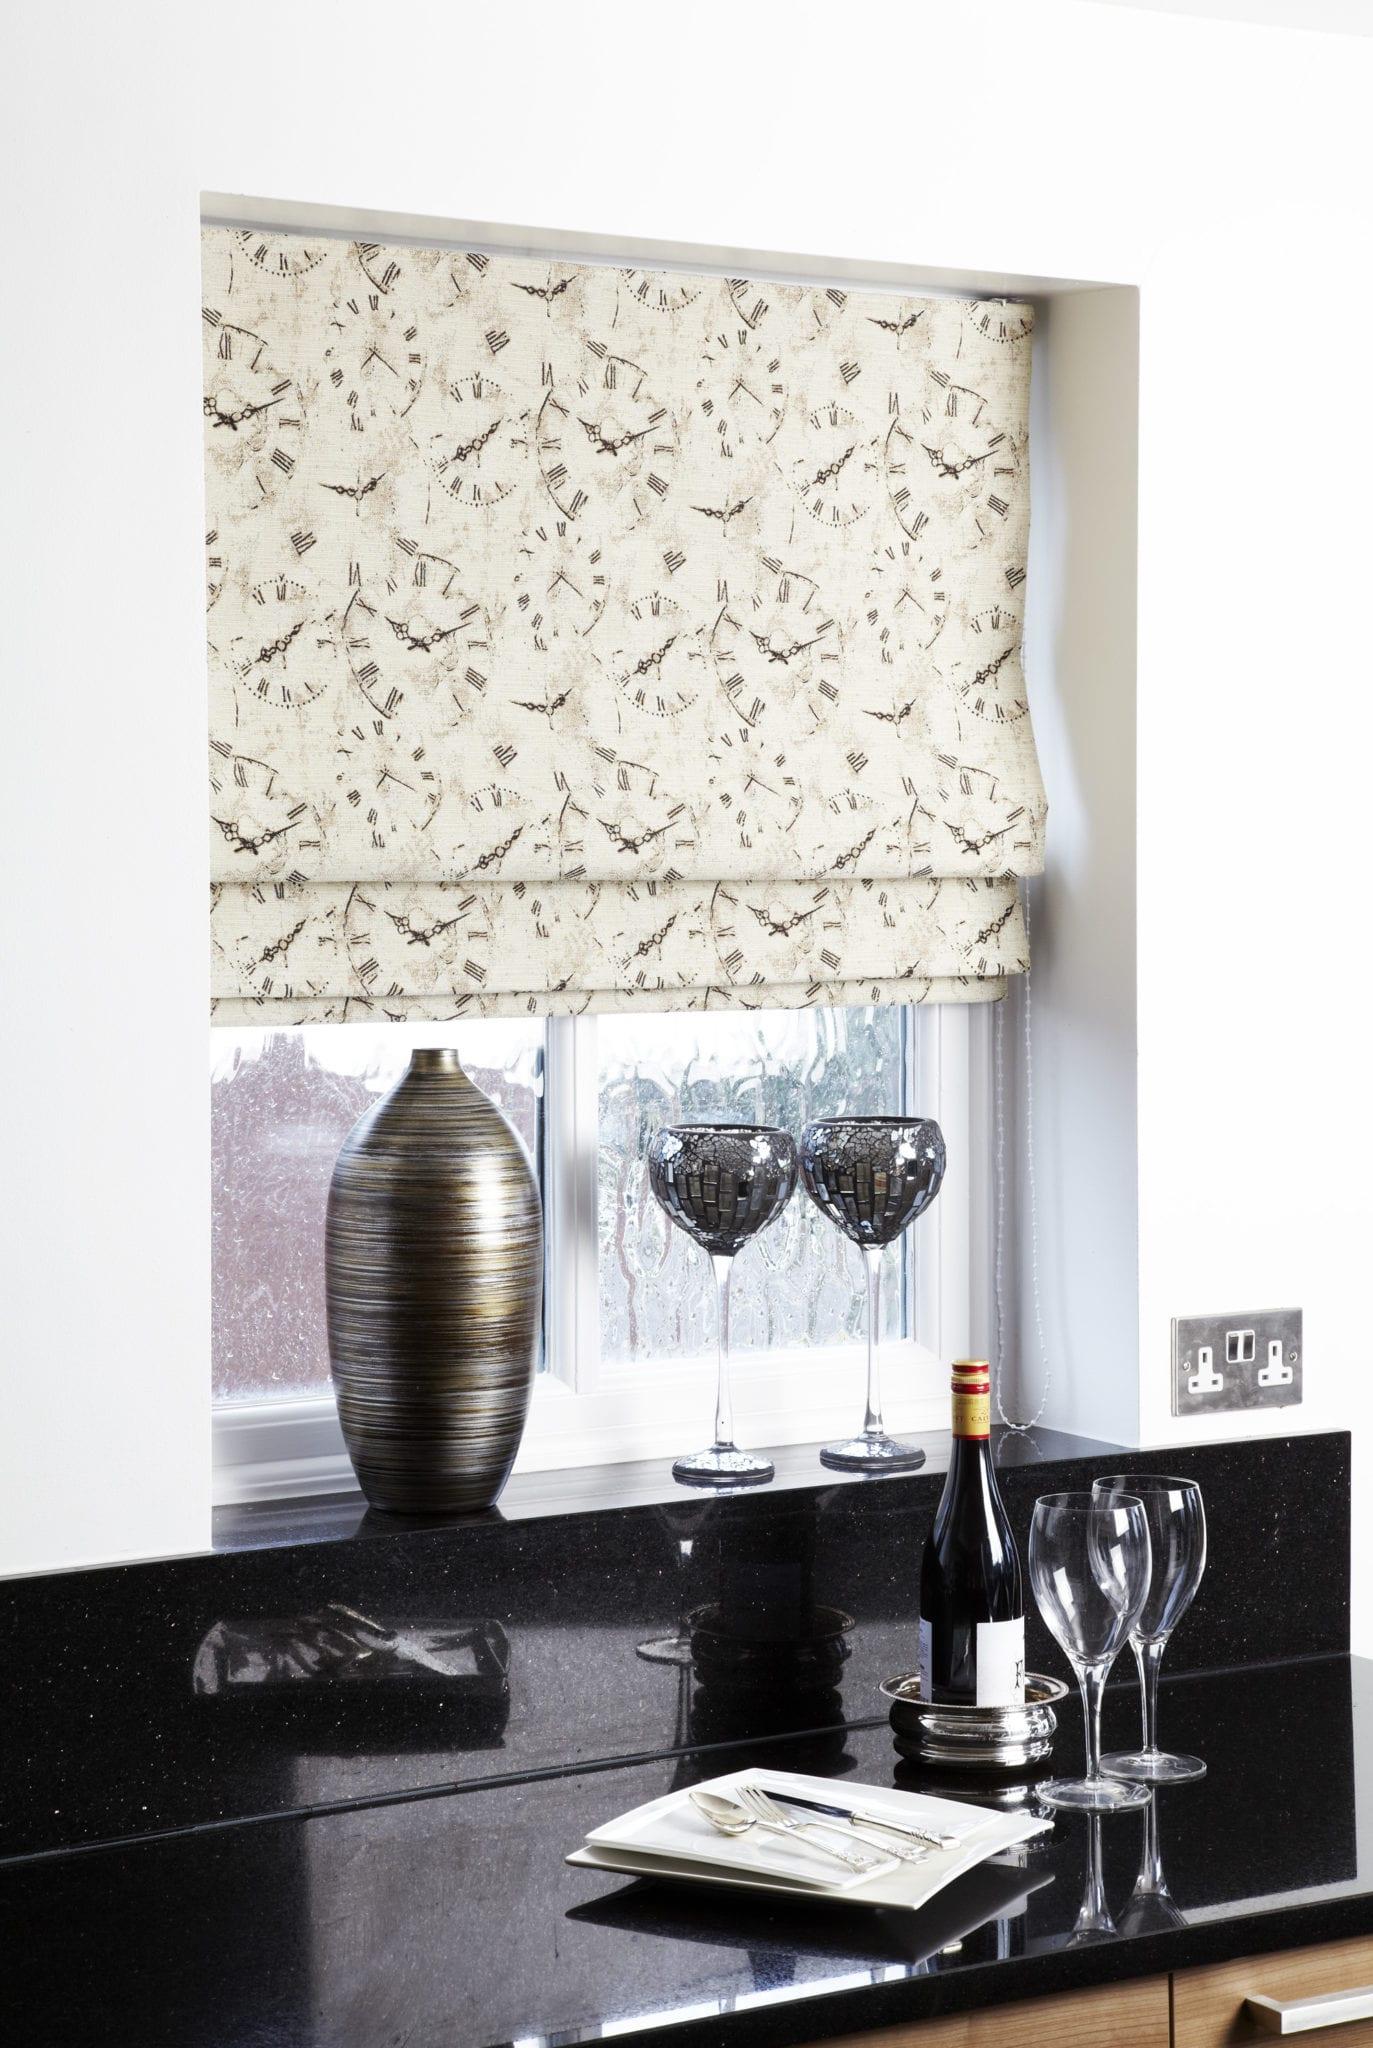 Clock pattern on roman blinds.